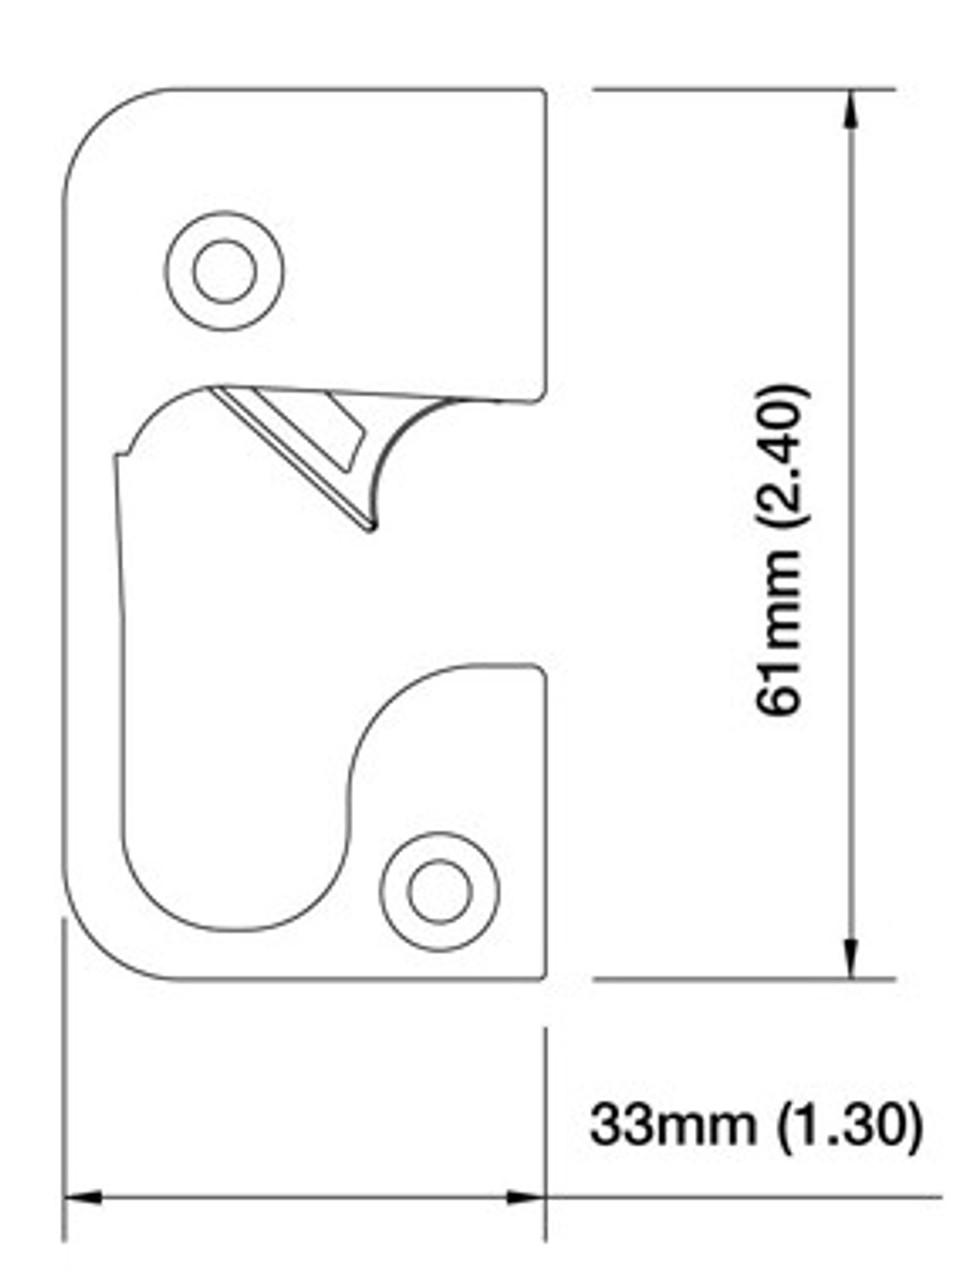 RA6133- RU1 Auto release strike and under plate Brass 8783867-8784775